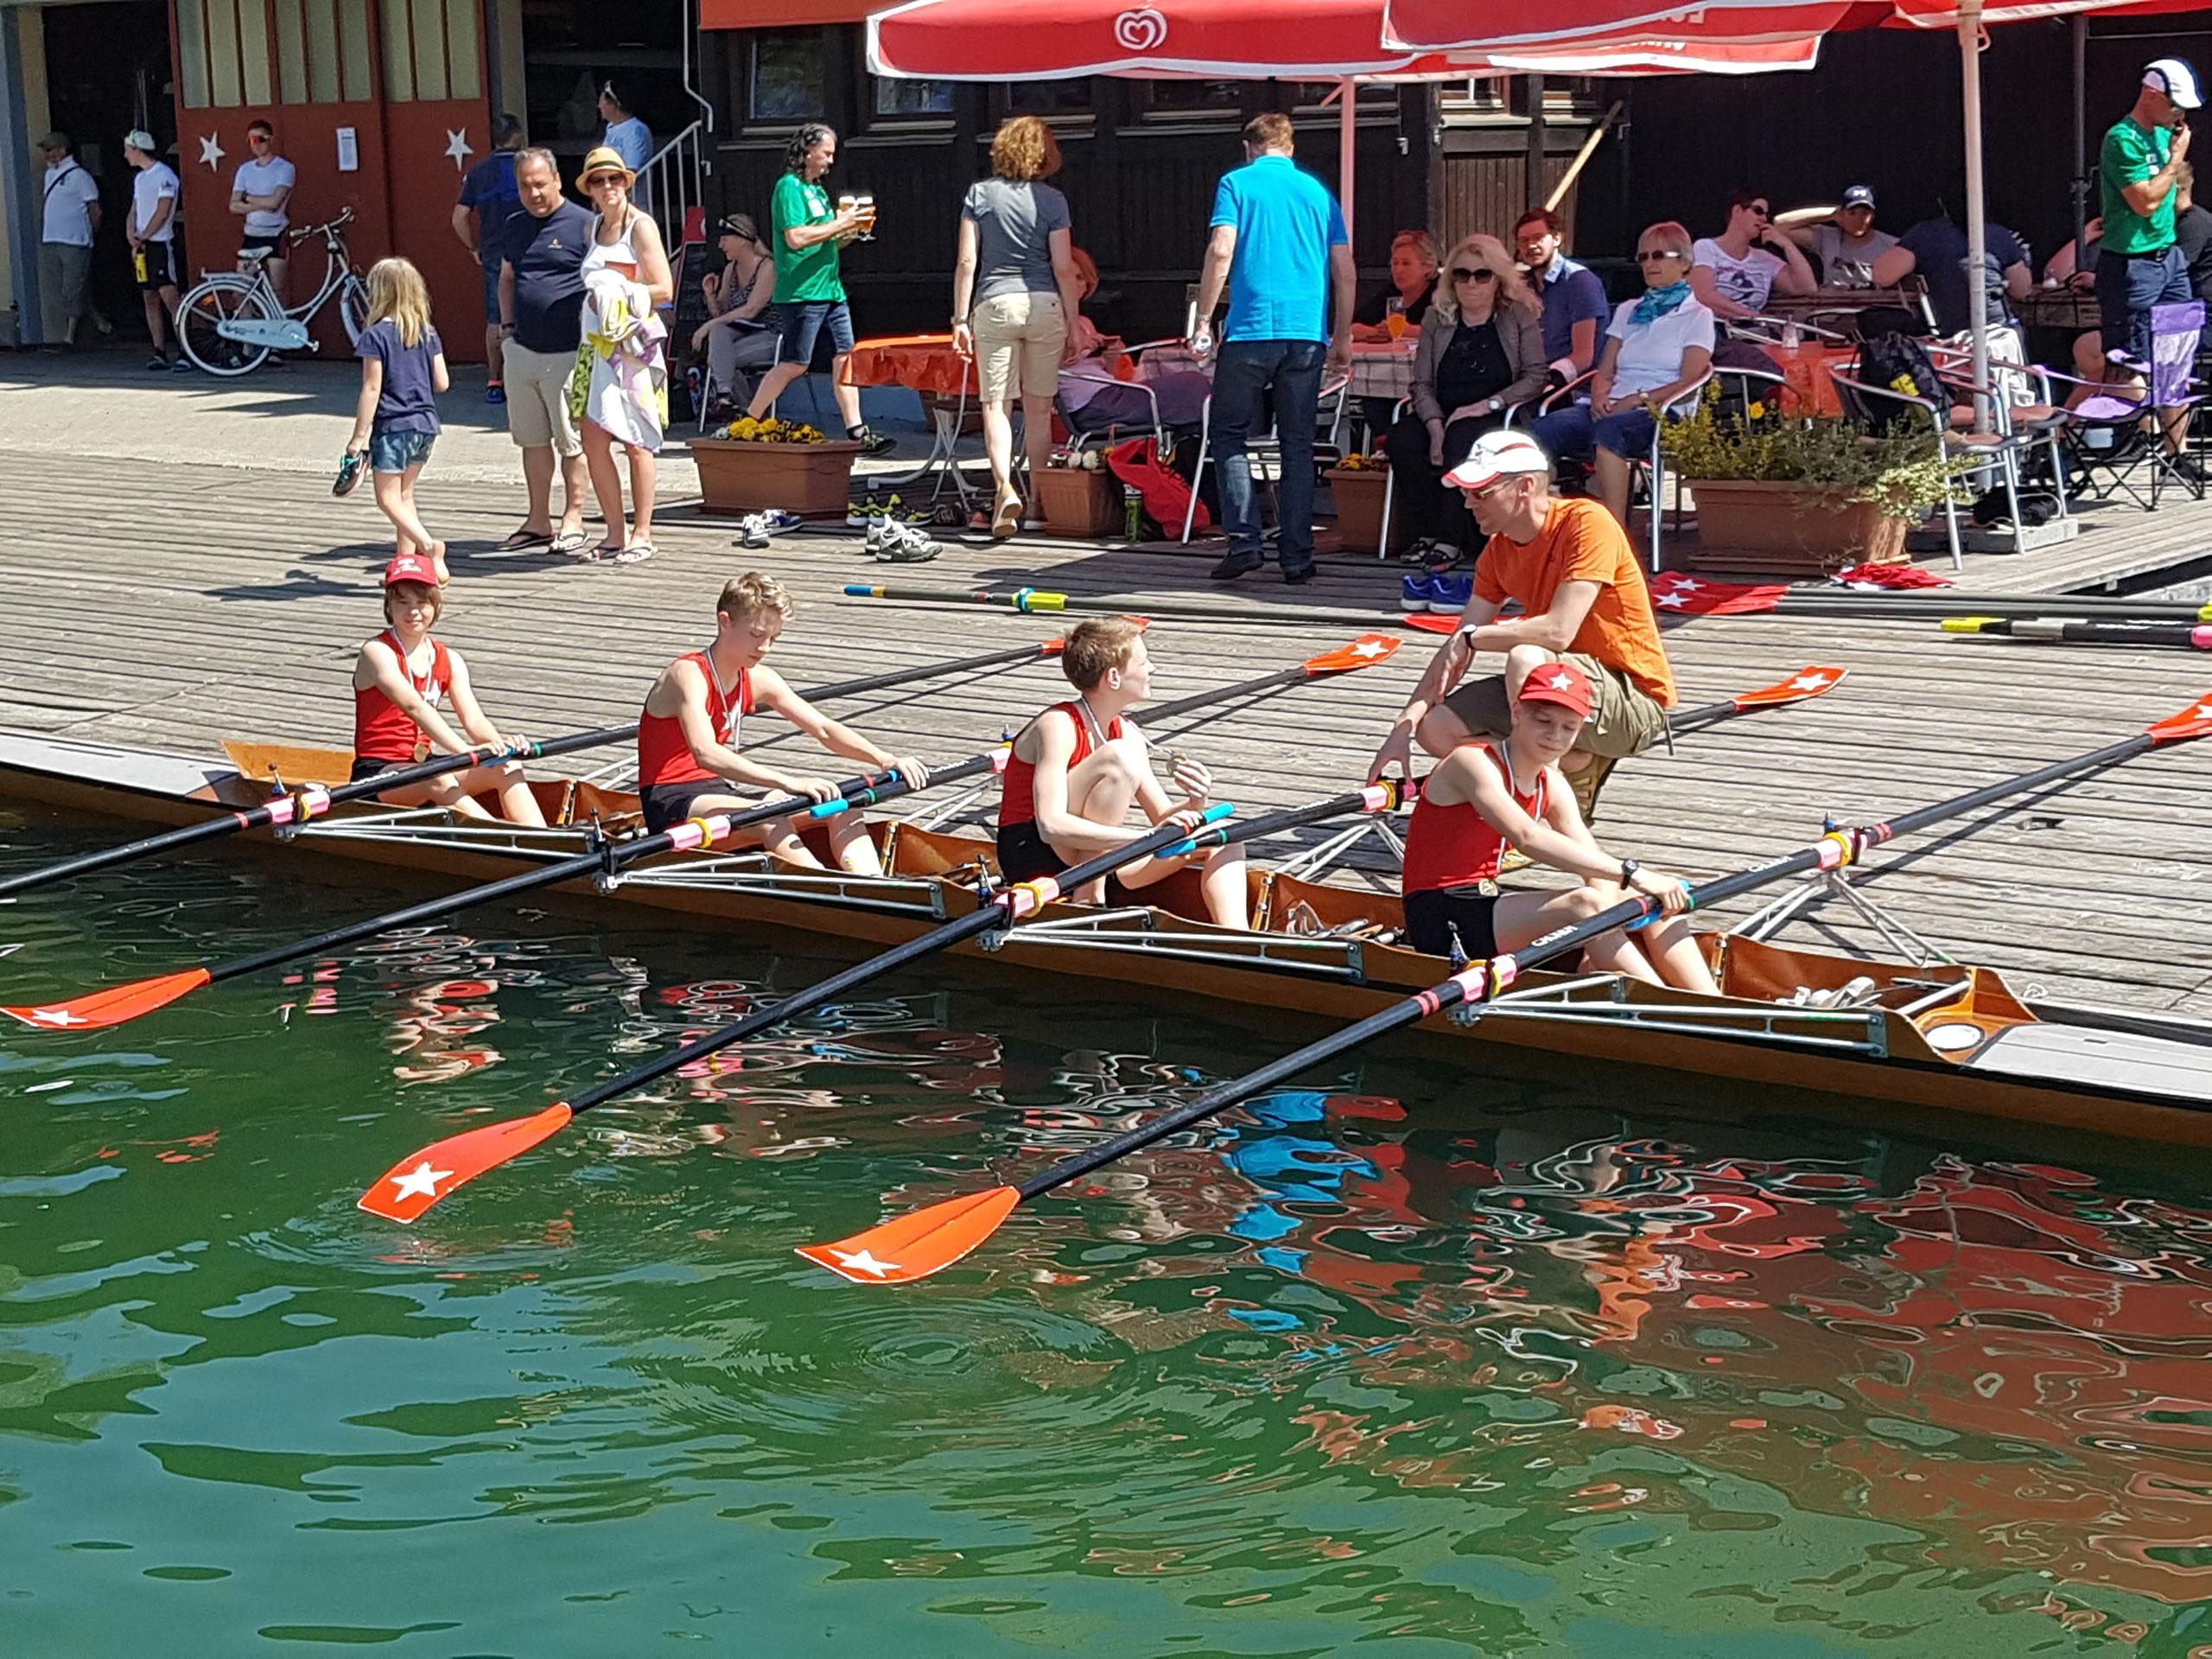 84. Kärntner Ruderregatta - Schüler Doppelvierer Platz 3: Felix Mikosch, Leo Oswald, Uli Oswald, Luca Darnhofer-Demar